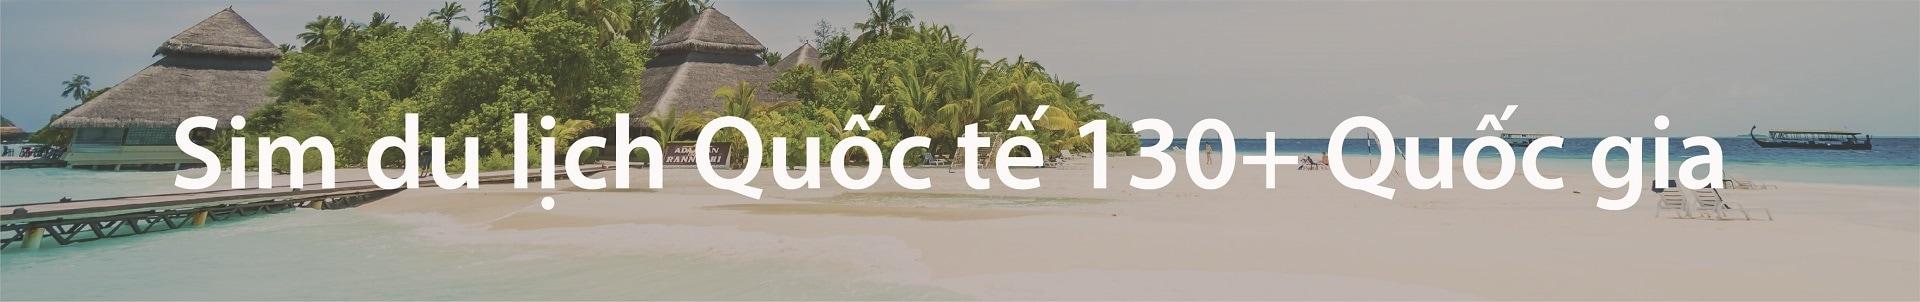 Sim du lịch quốc tế 130+ quốc gia